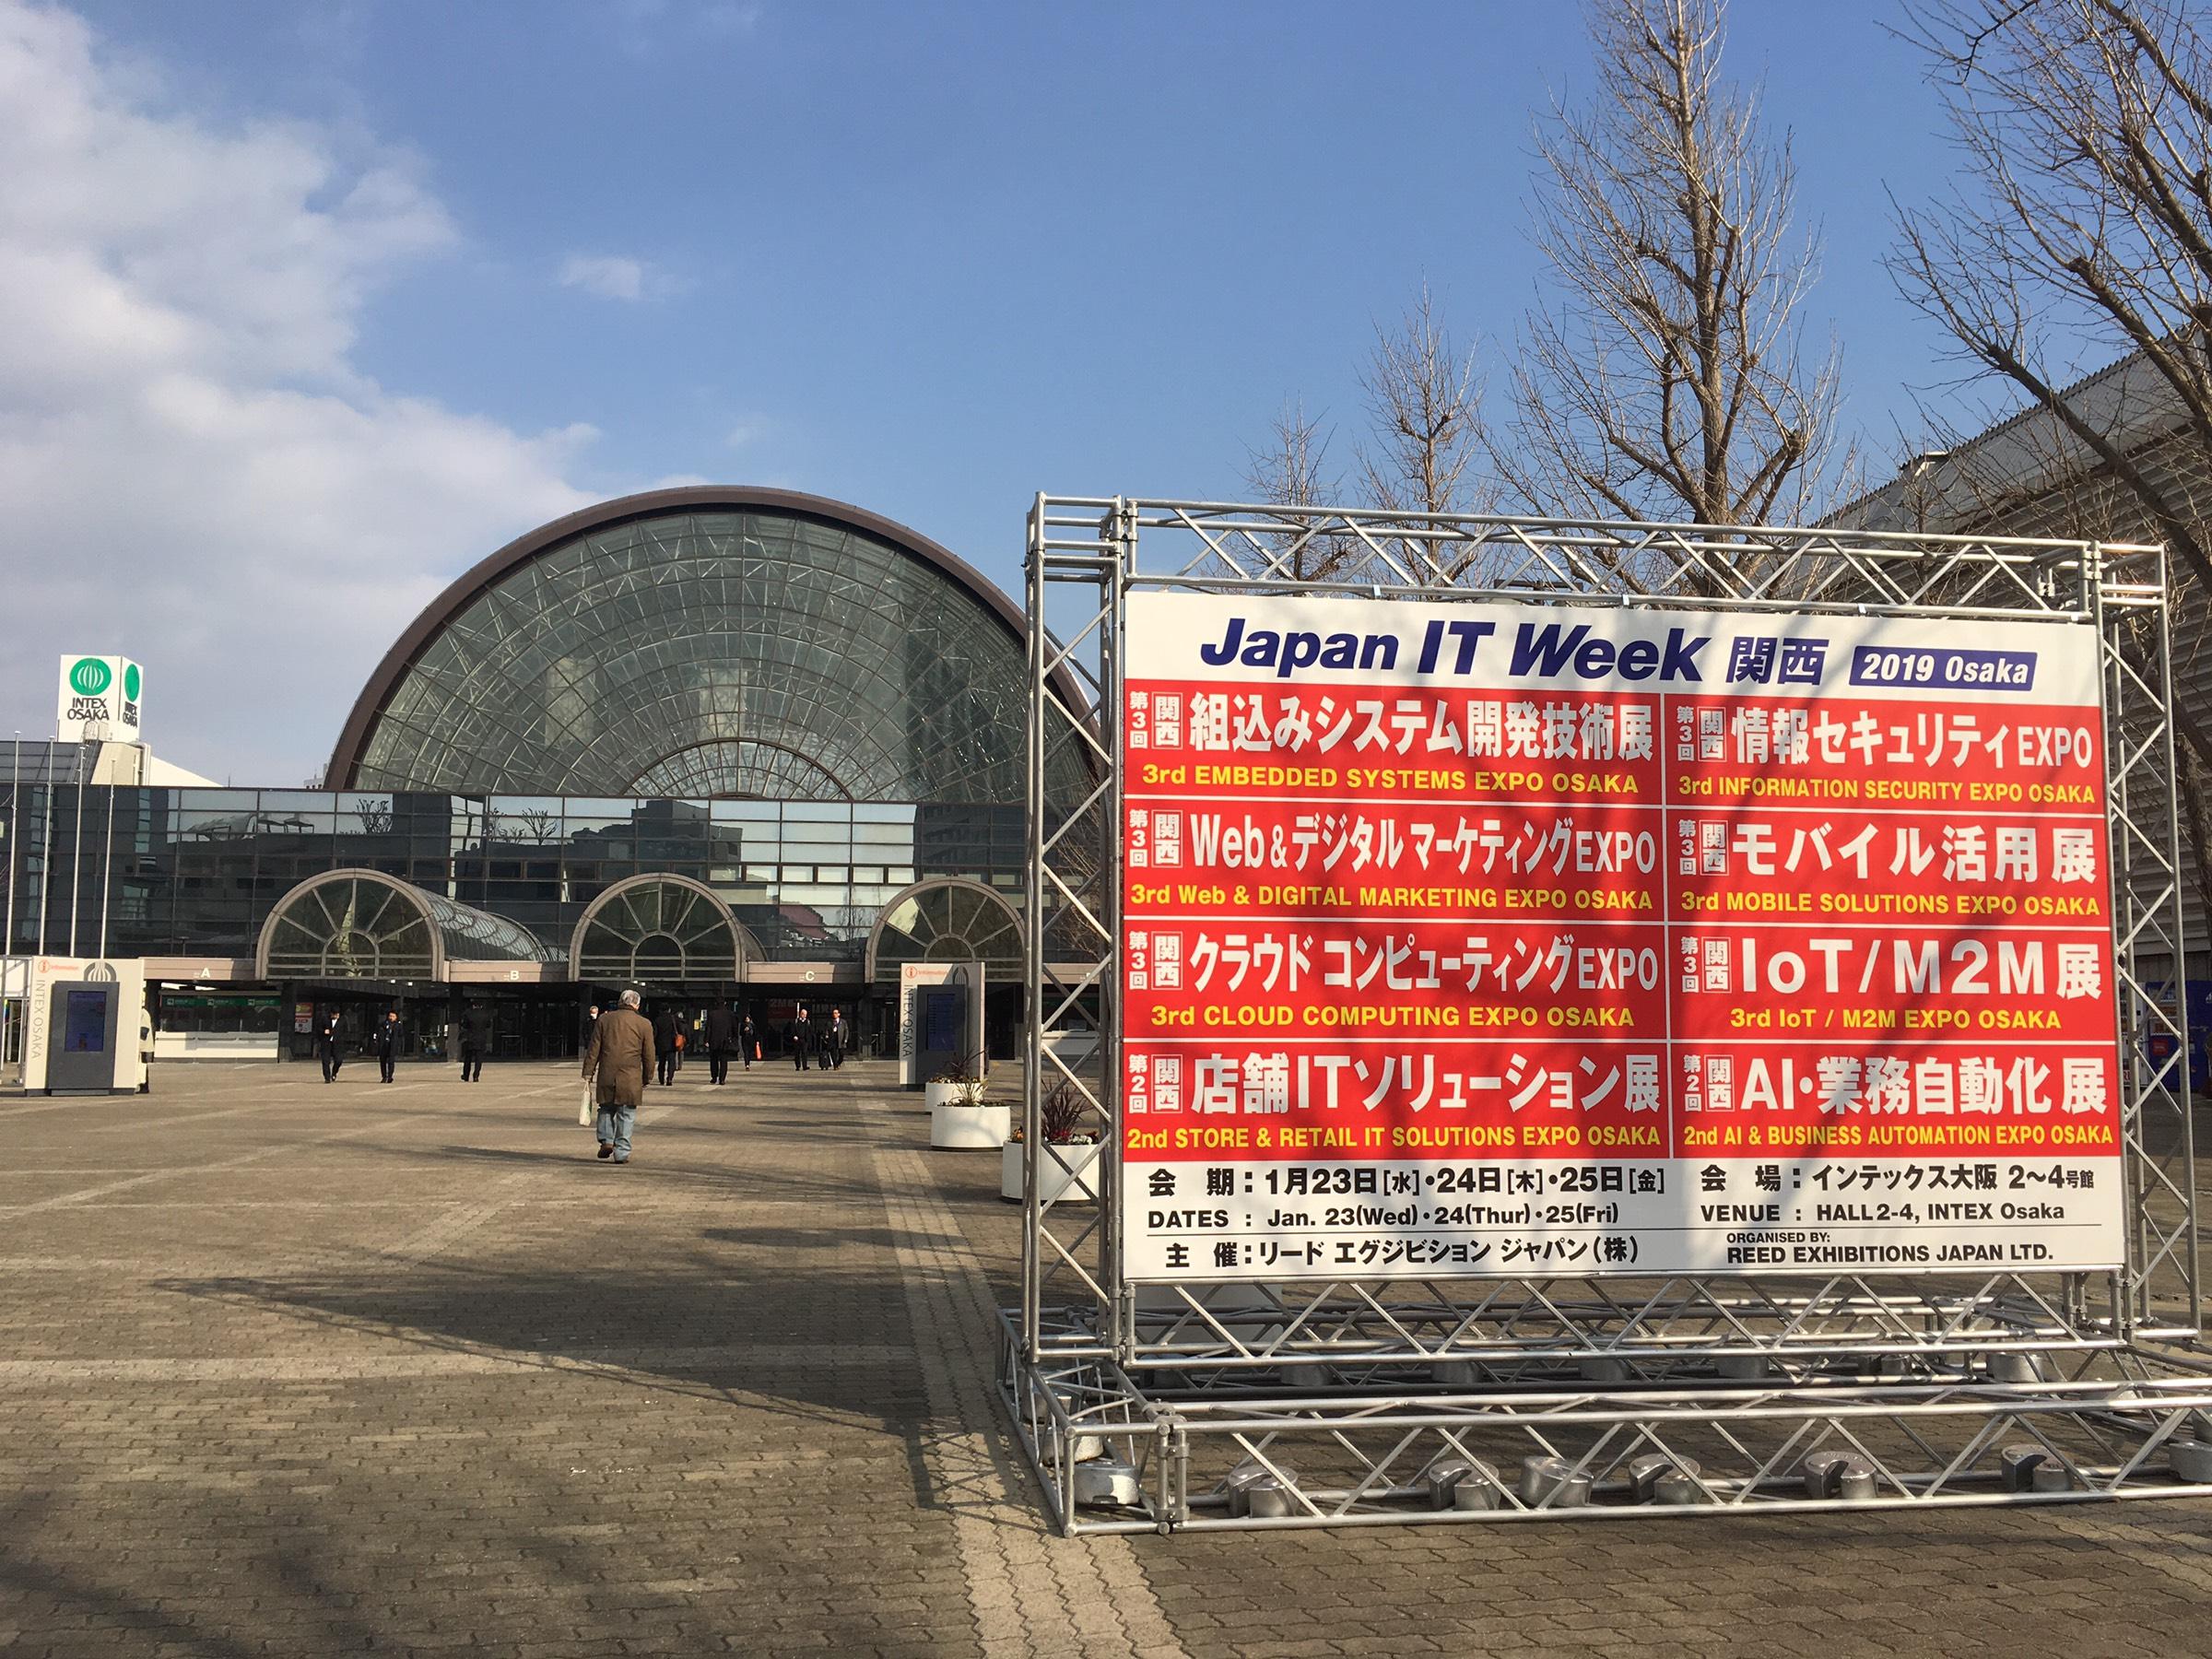 「Japan IT Week 関西」当日の様子をレポート